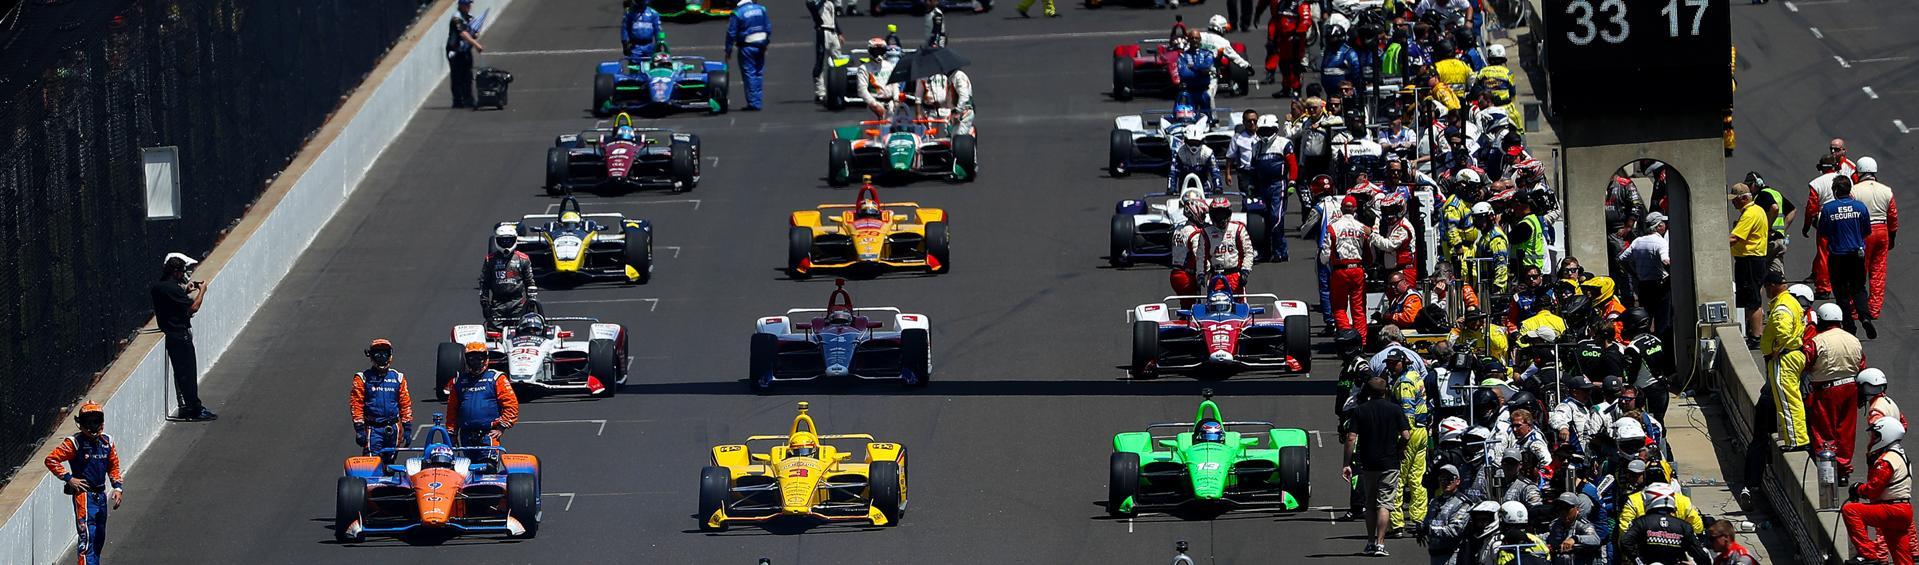 Indianapolis 500 in 2018 in Indianapolis, Indiana.